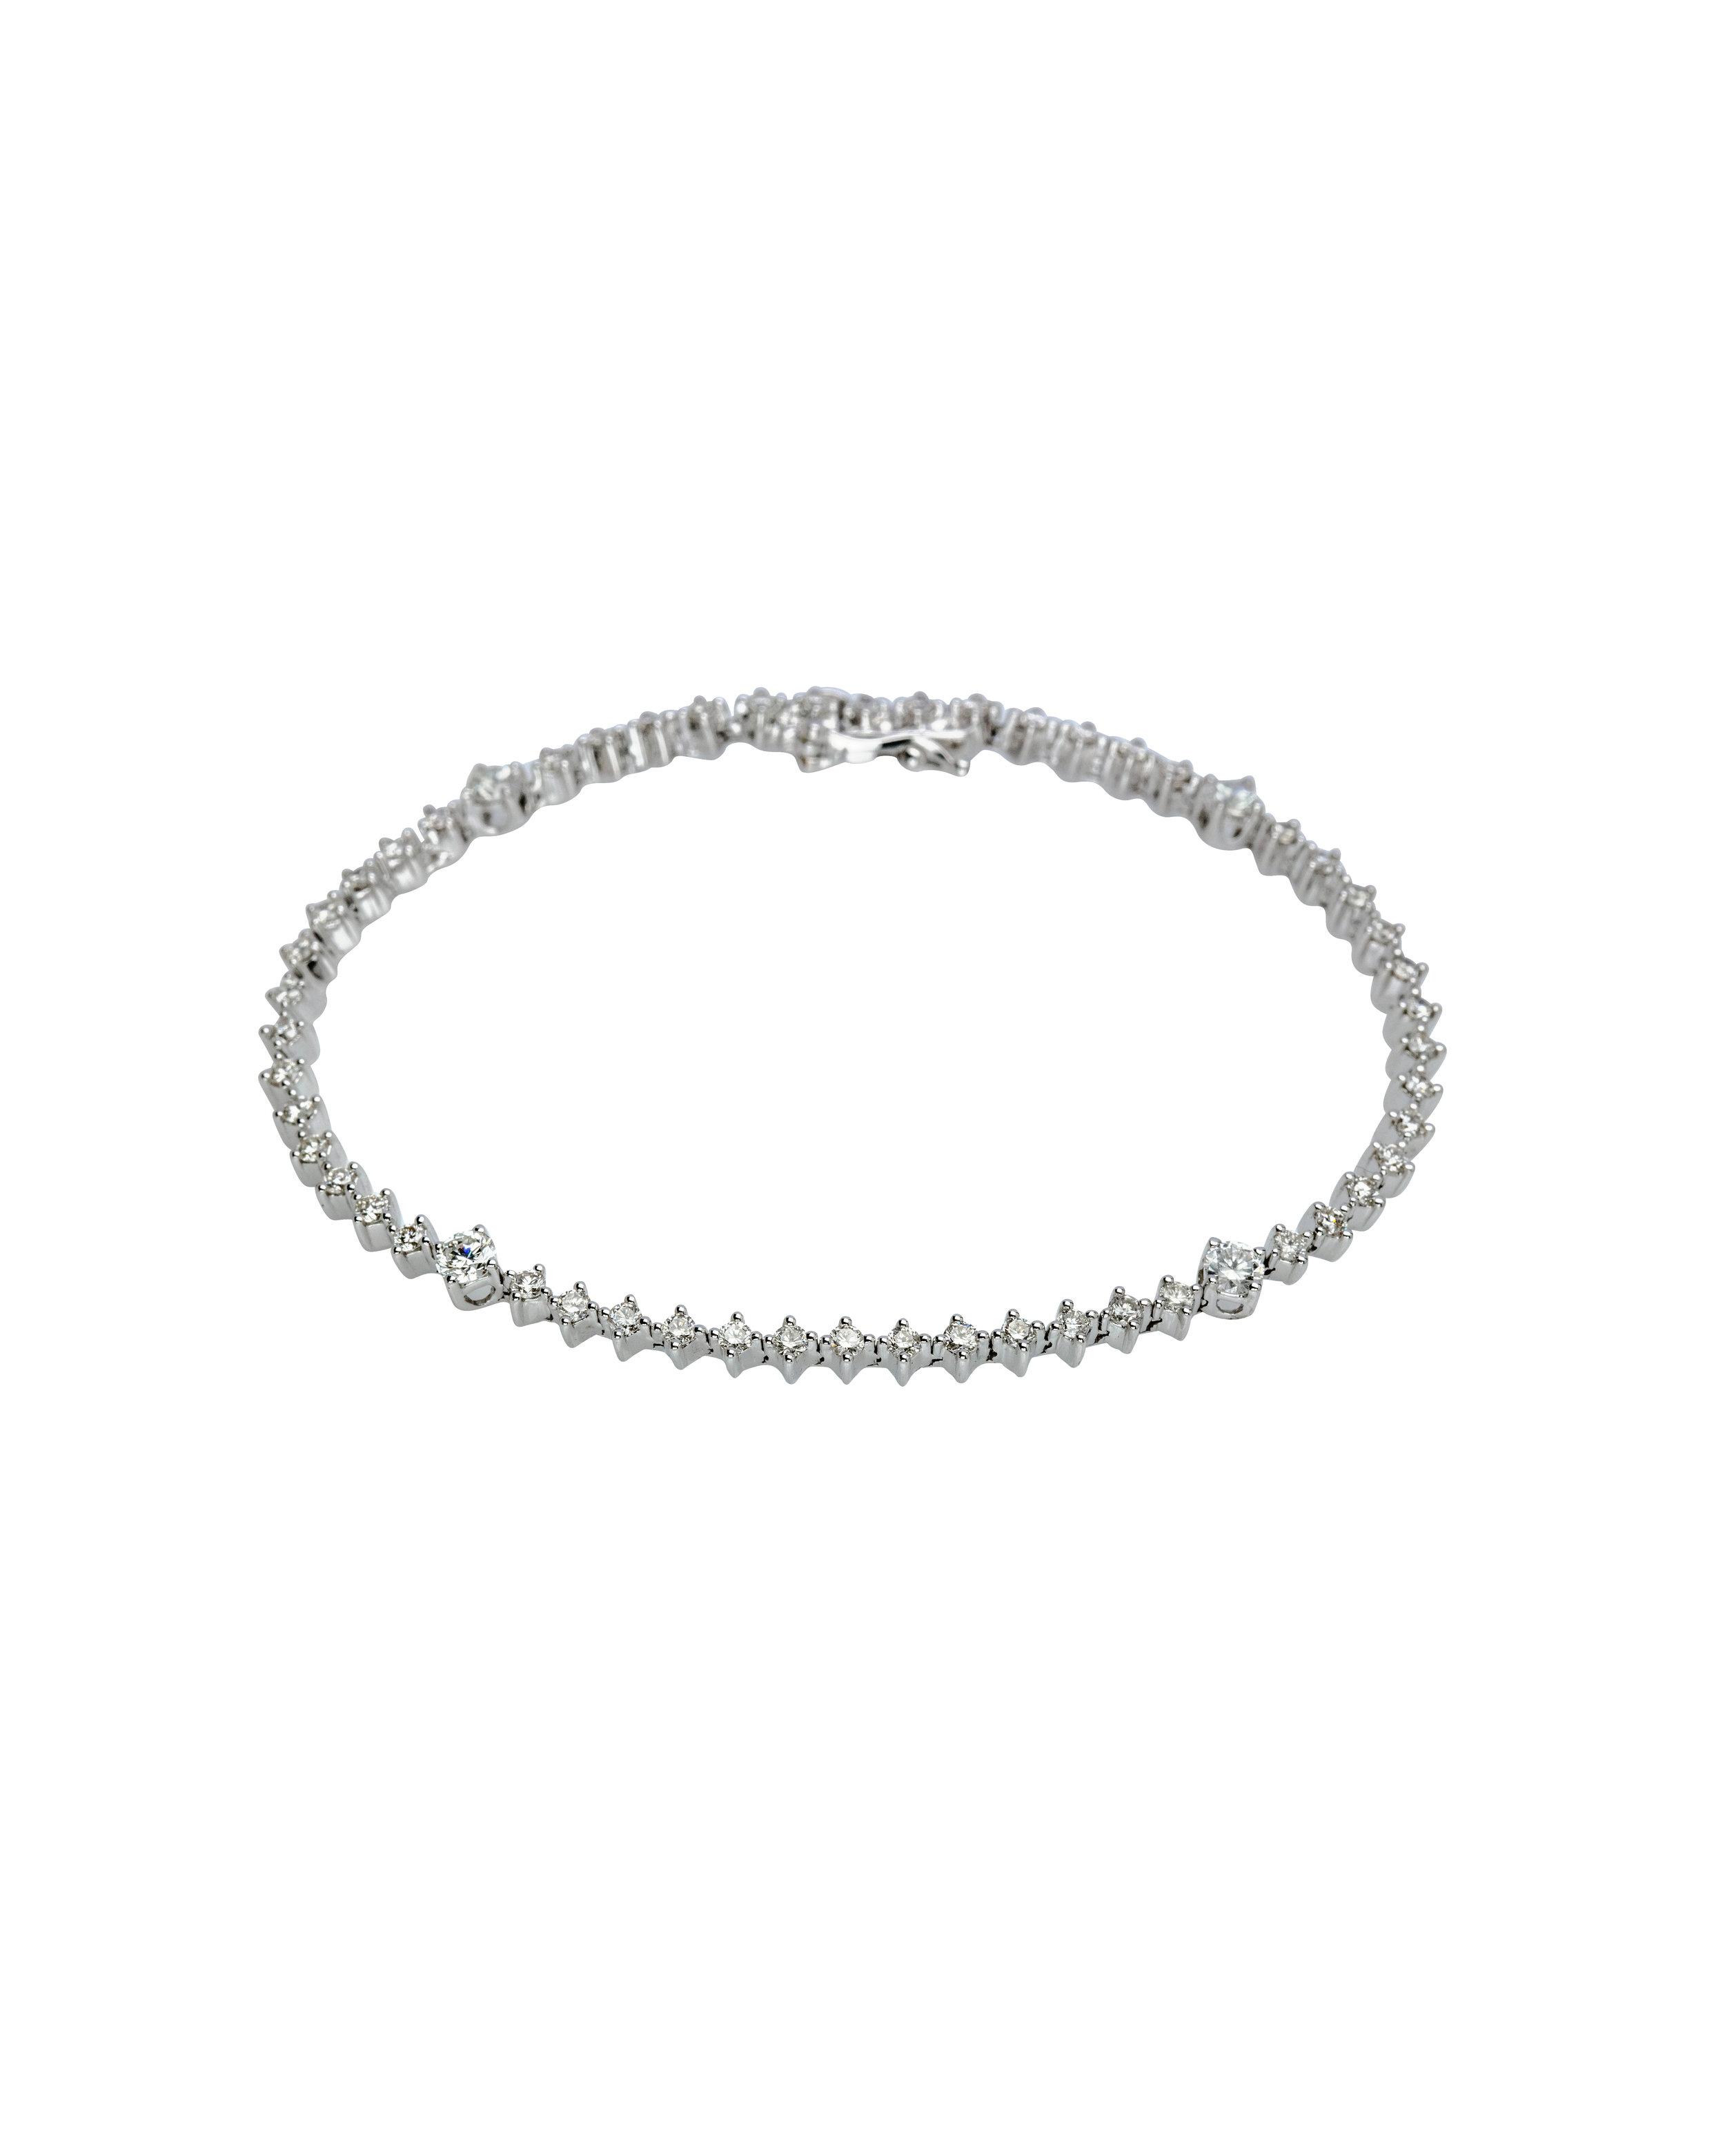 designer diamond bridal jewelry-20146.jpg